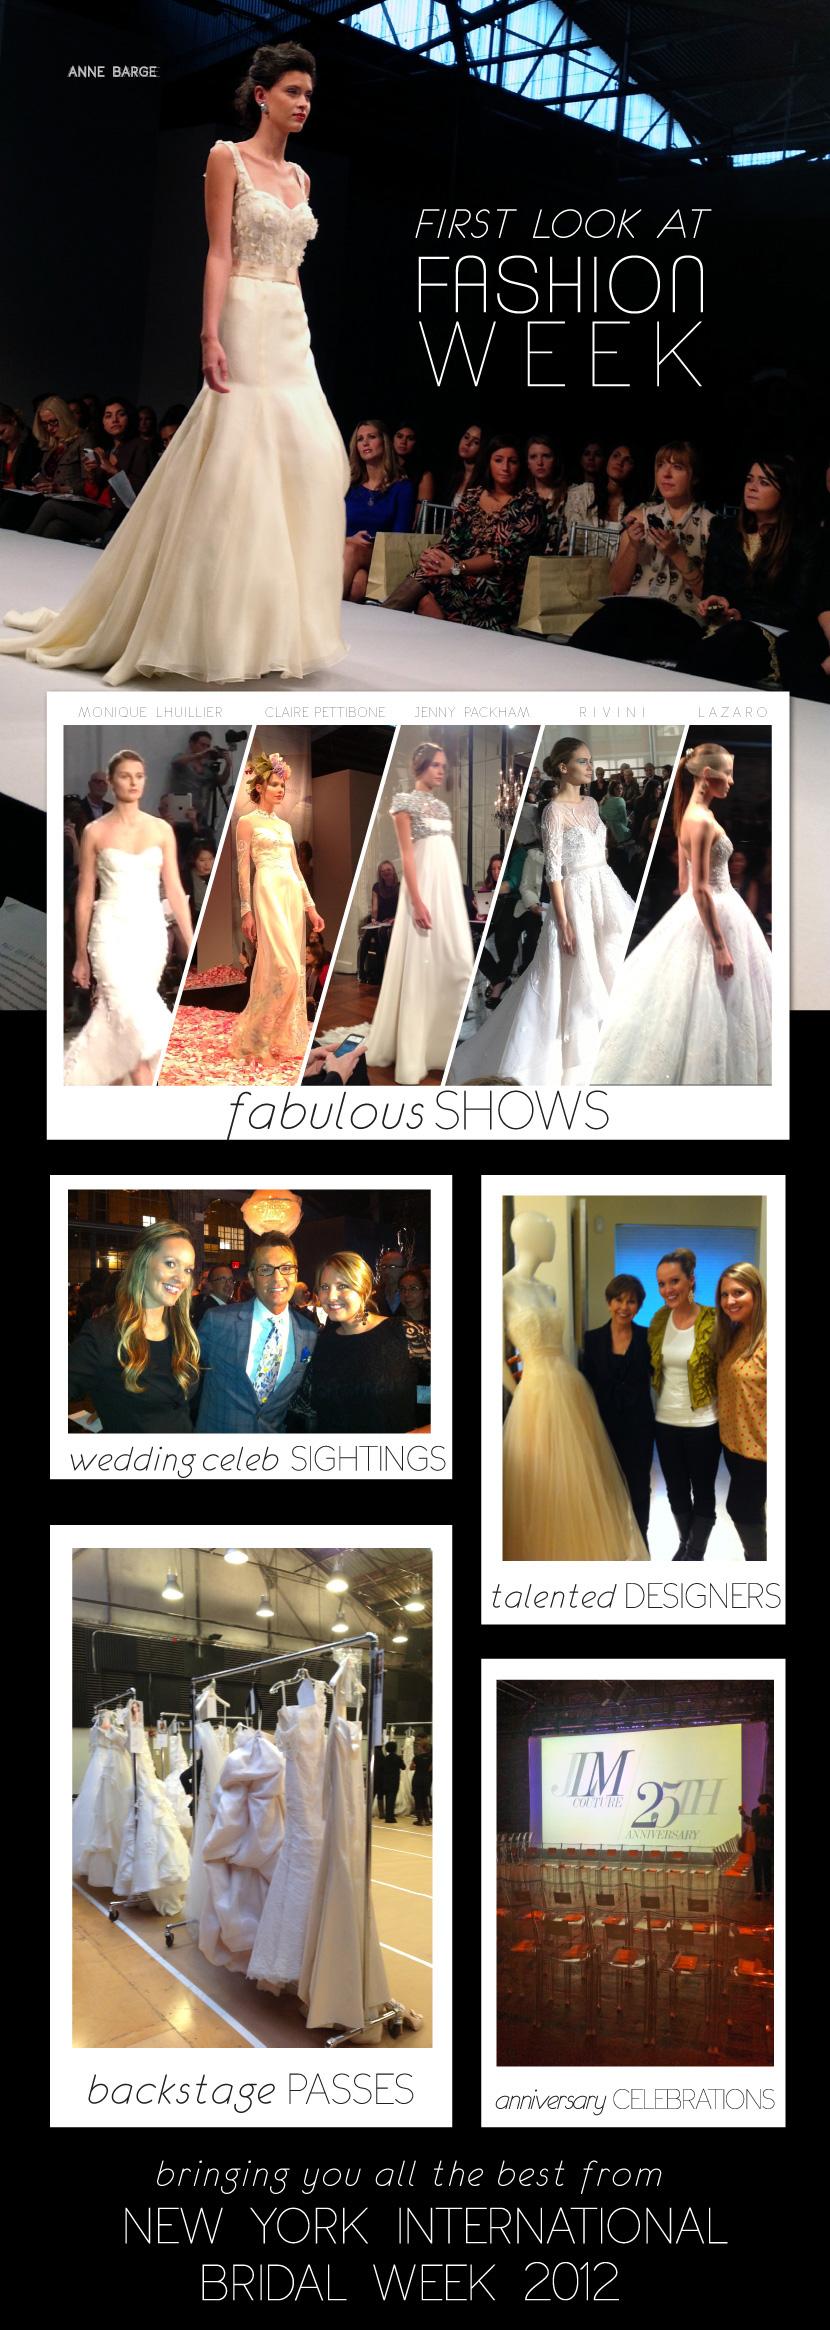 fashionweek_kickoff2